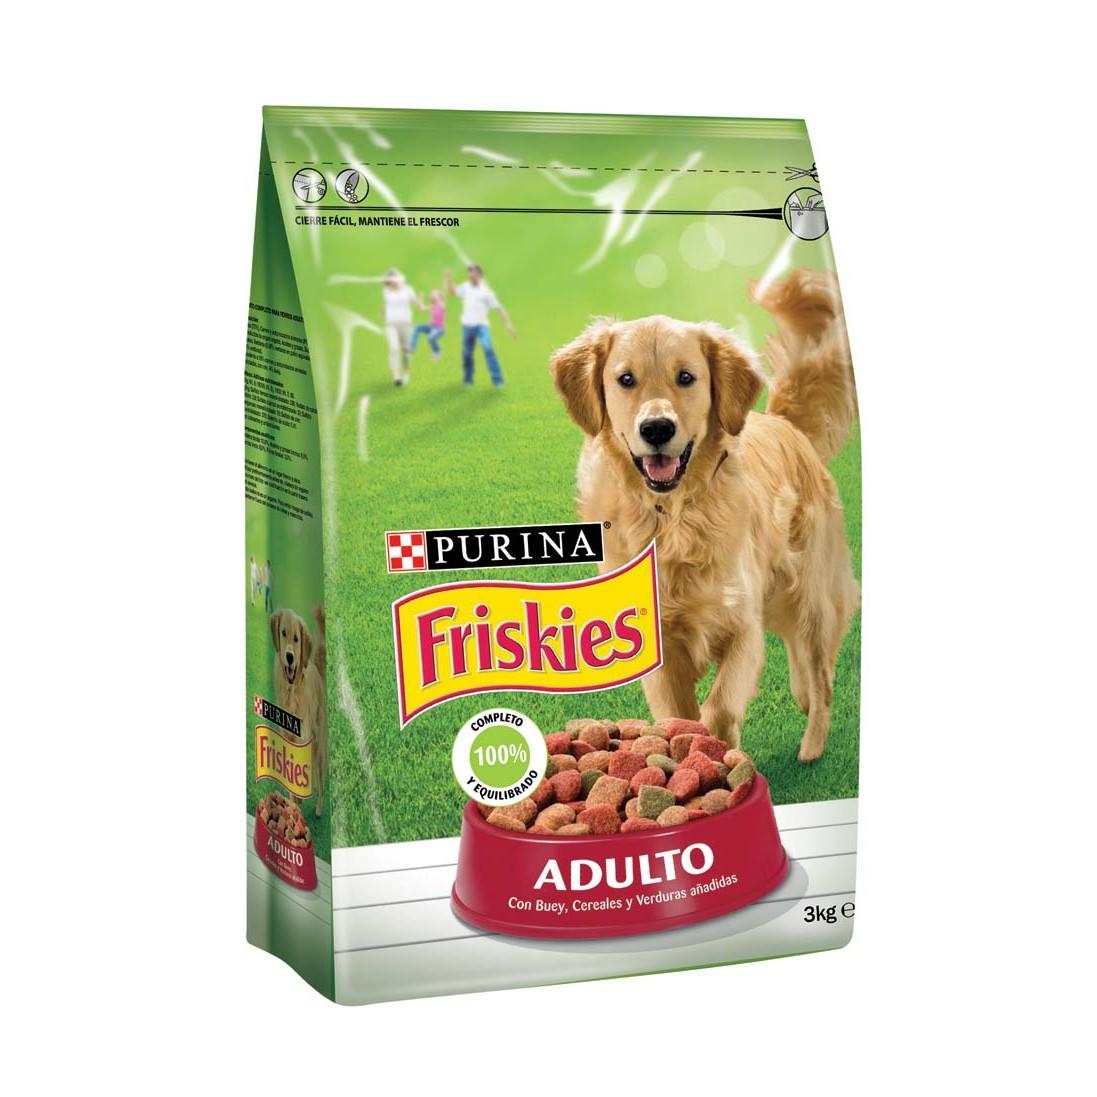 Friskies Dog Adult Food 3kg